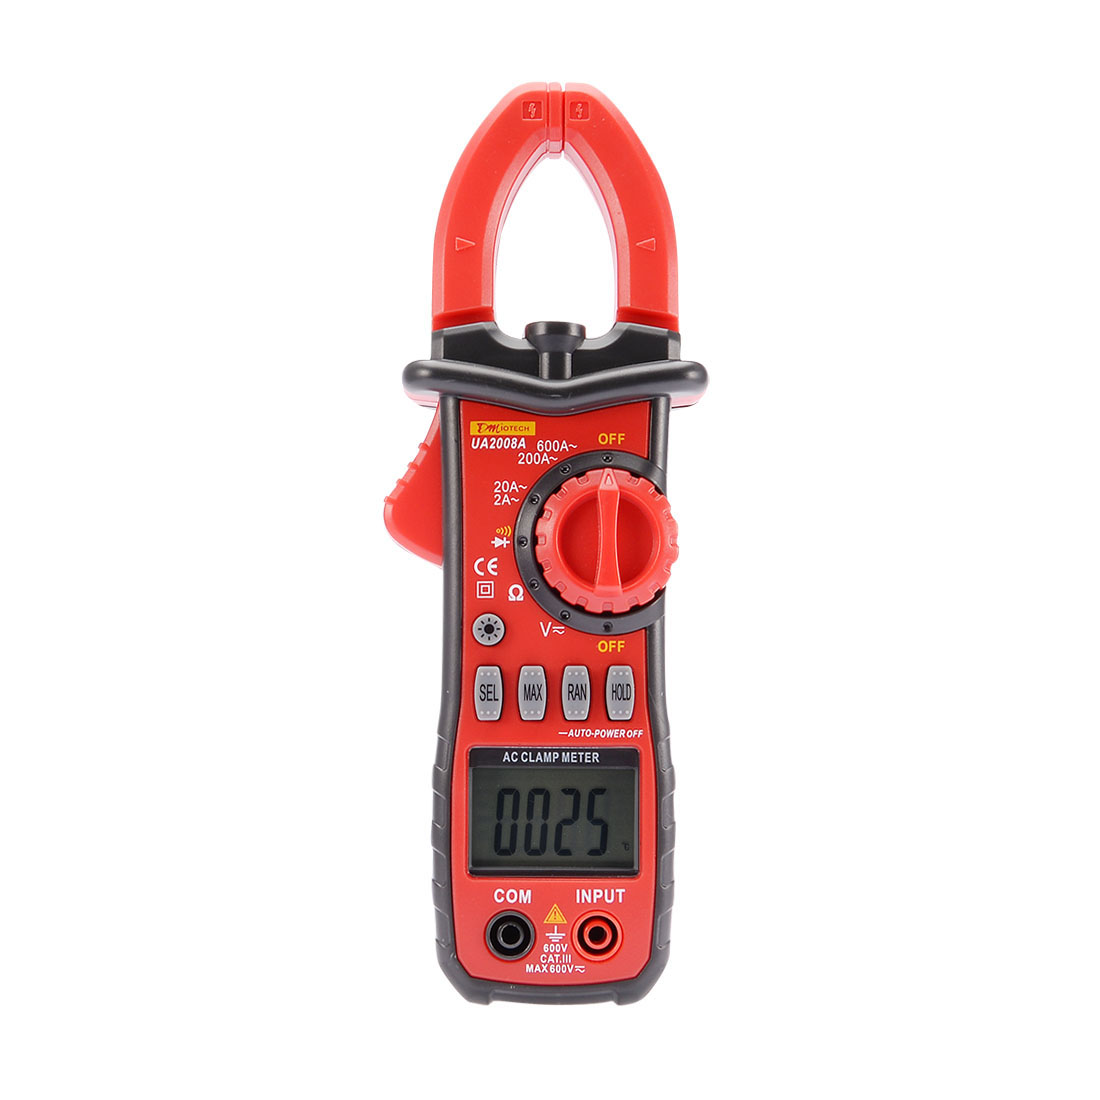 UA2008A Volt Tester Ammeter AC 600A Digital Clamp Meter Multimeter w Flashlight